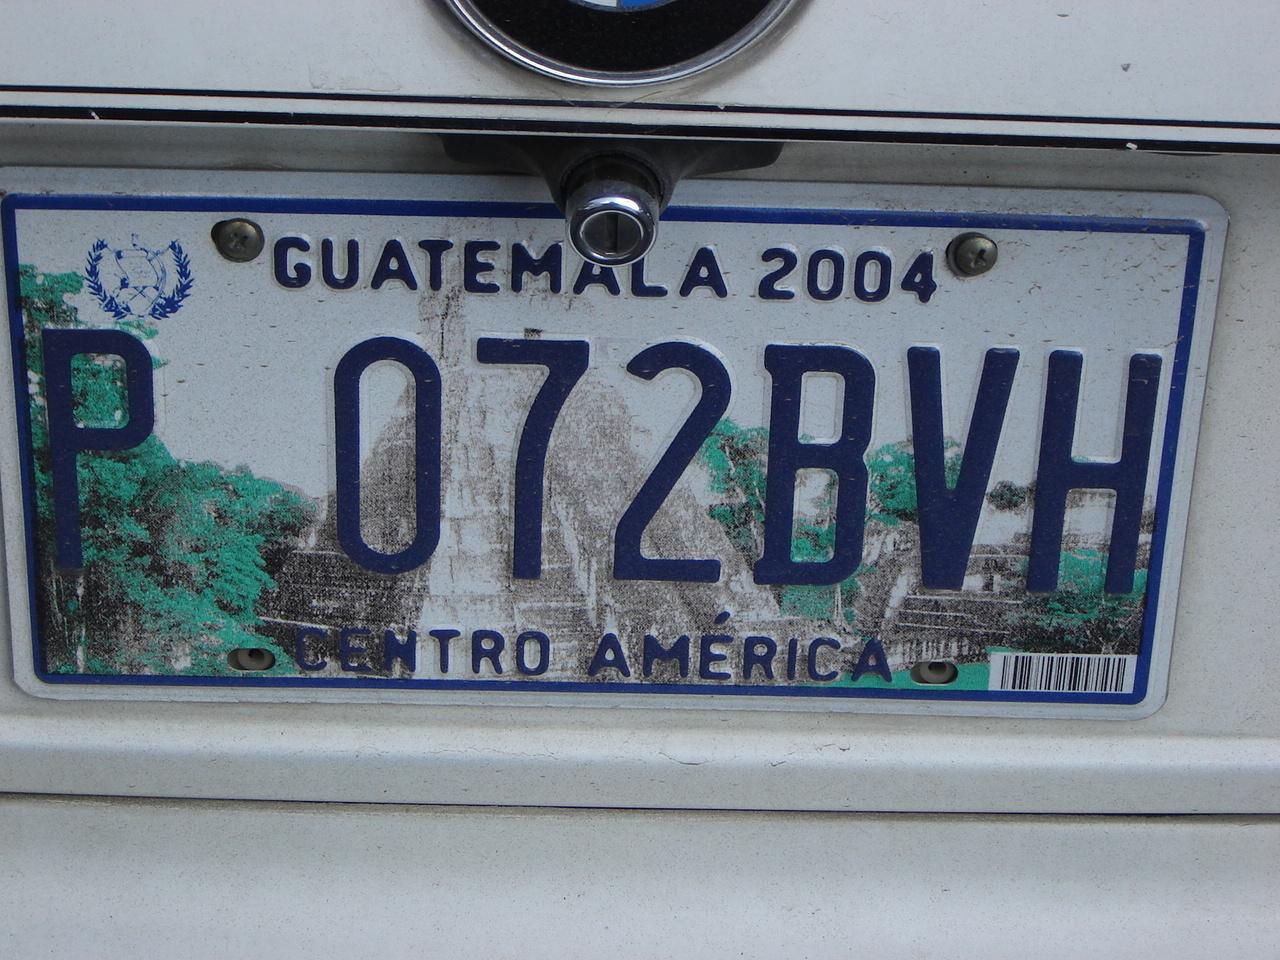 Guatemalan license plate